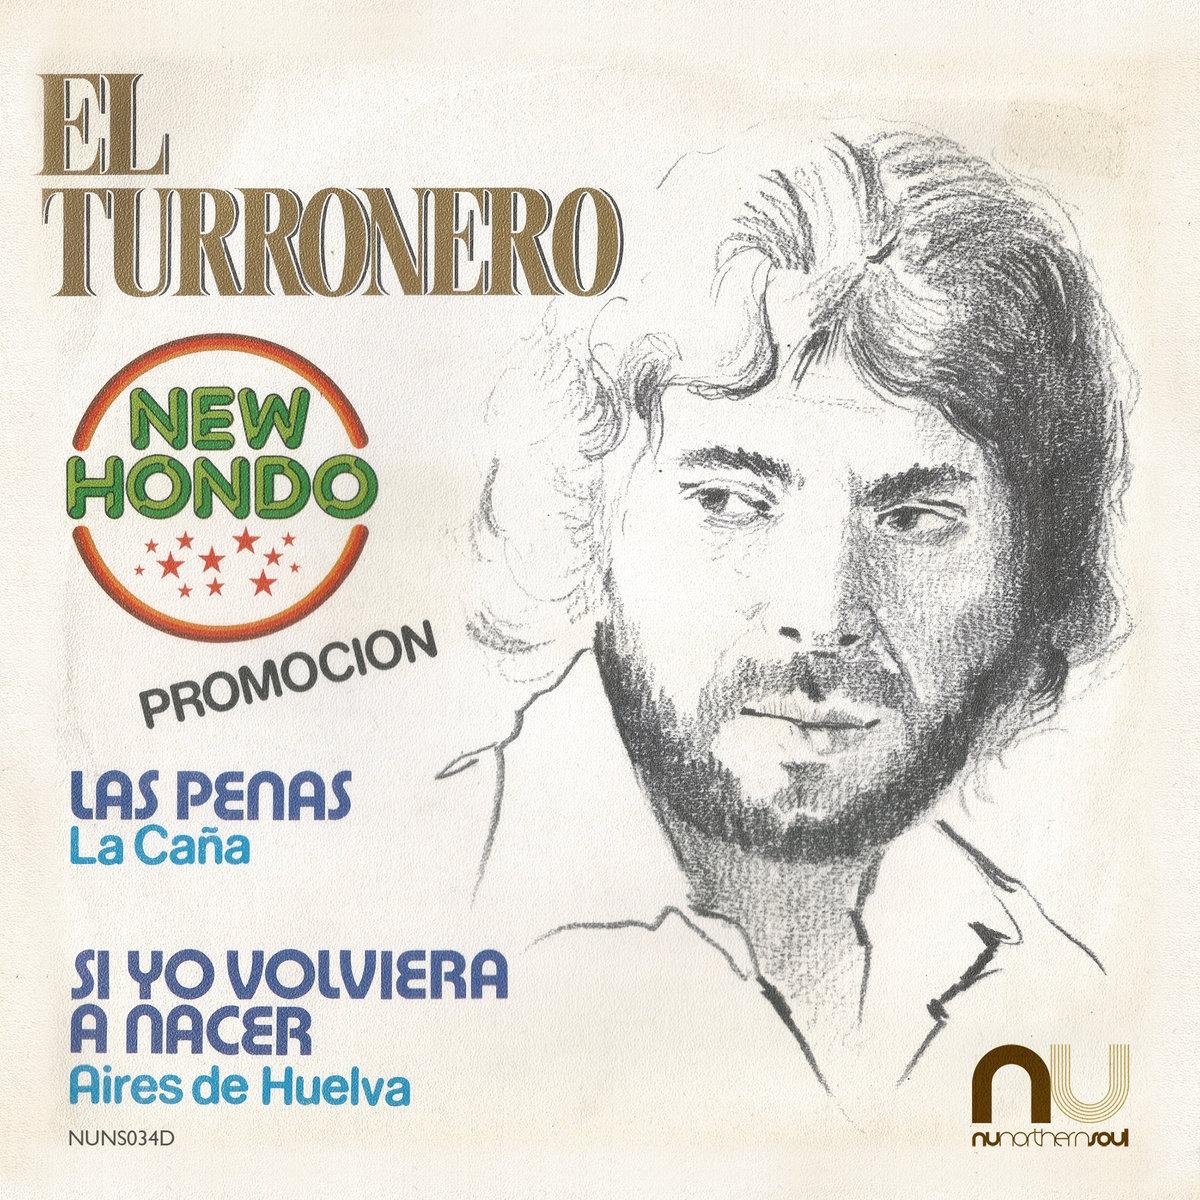 @PhatPhilCooper LISTEN : El Turronero 'New Hondo' Link Thumbnail | Linktree